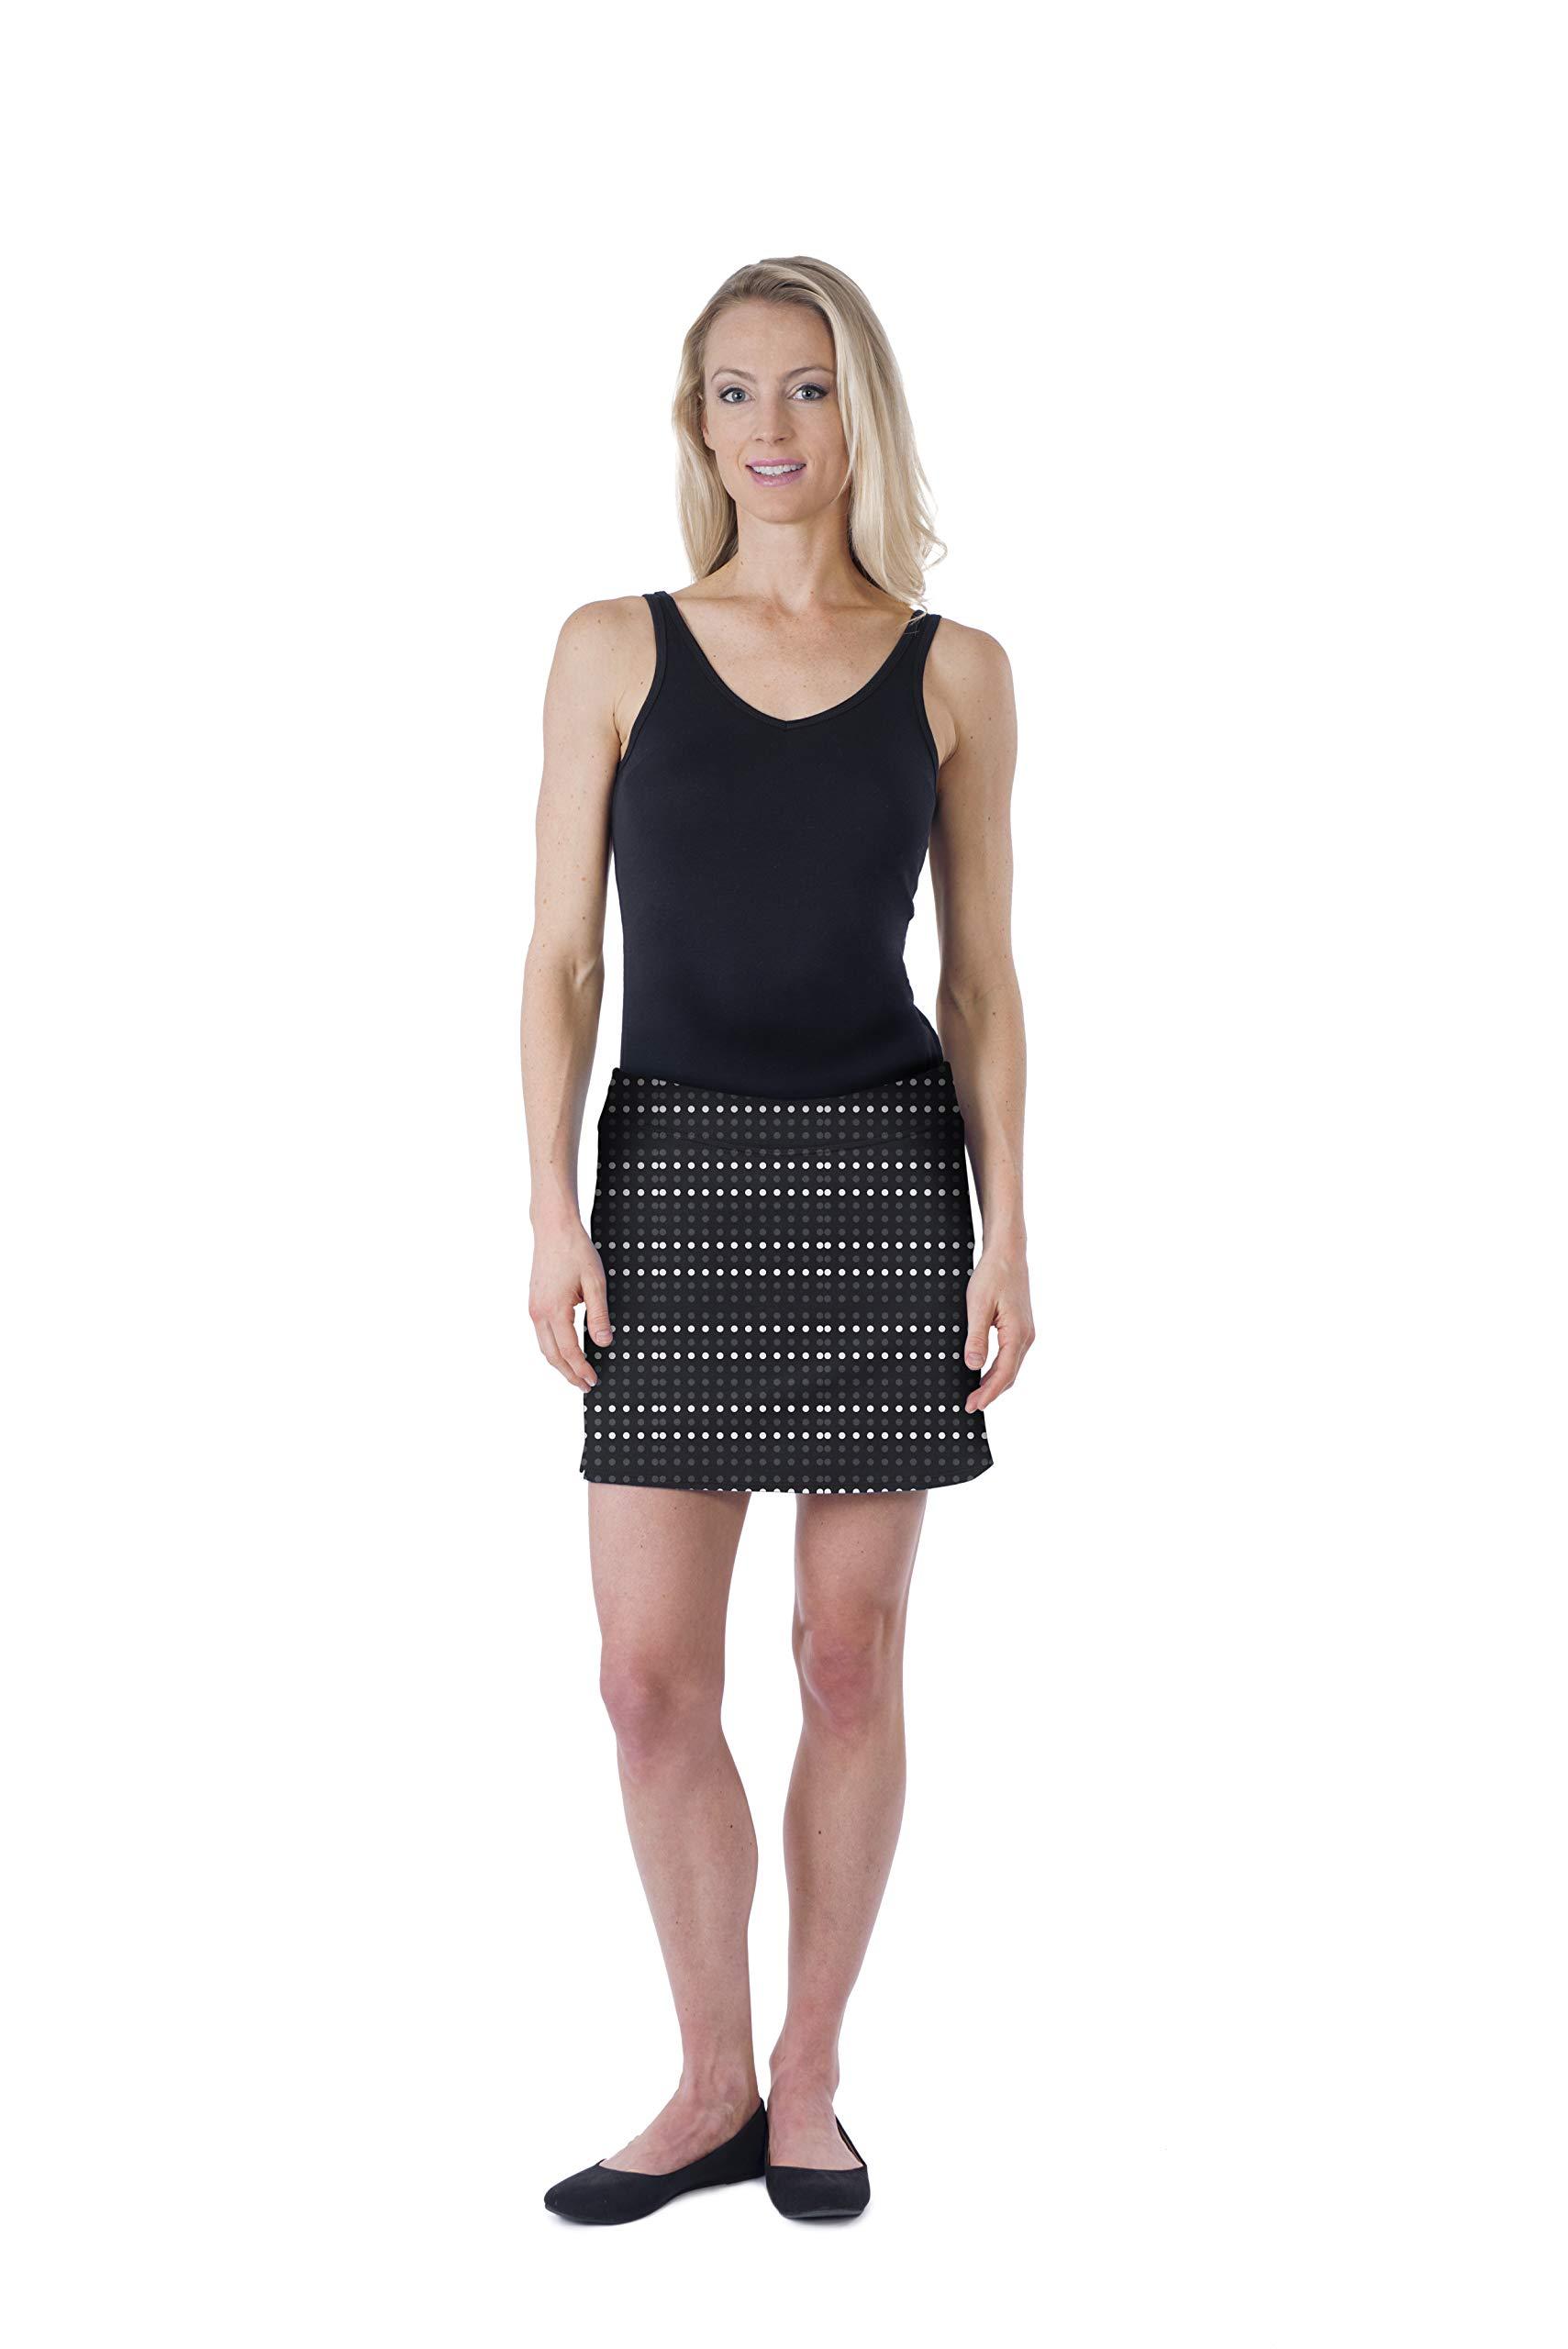 Colorado Clothing Women's Everyday Skort (Polka Dot Black, X-Large) by Colorado Clothing